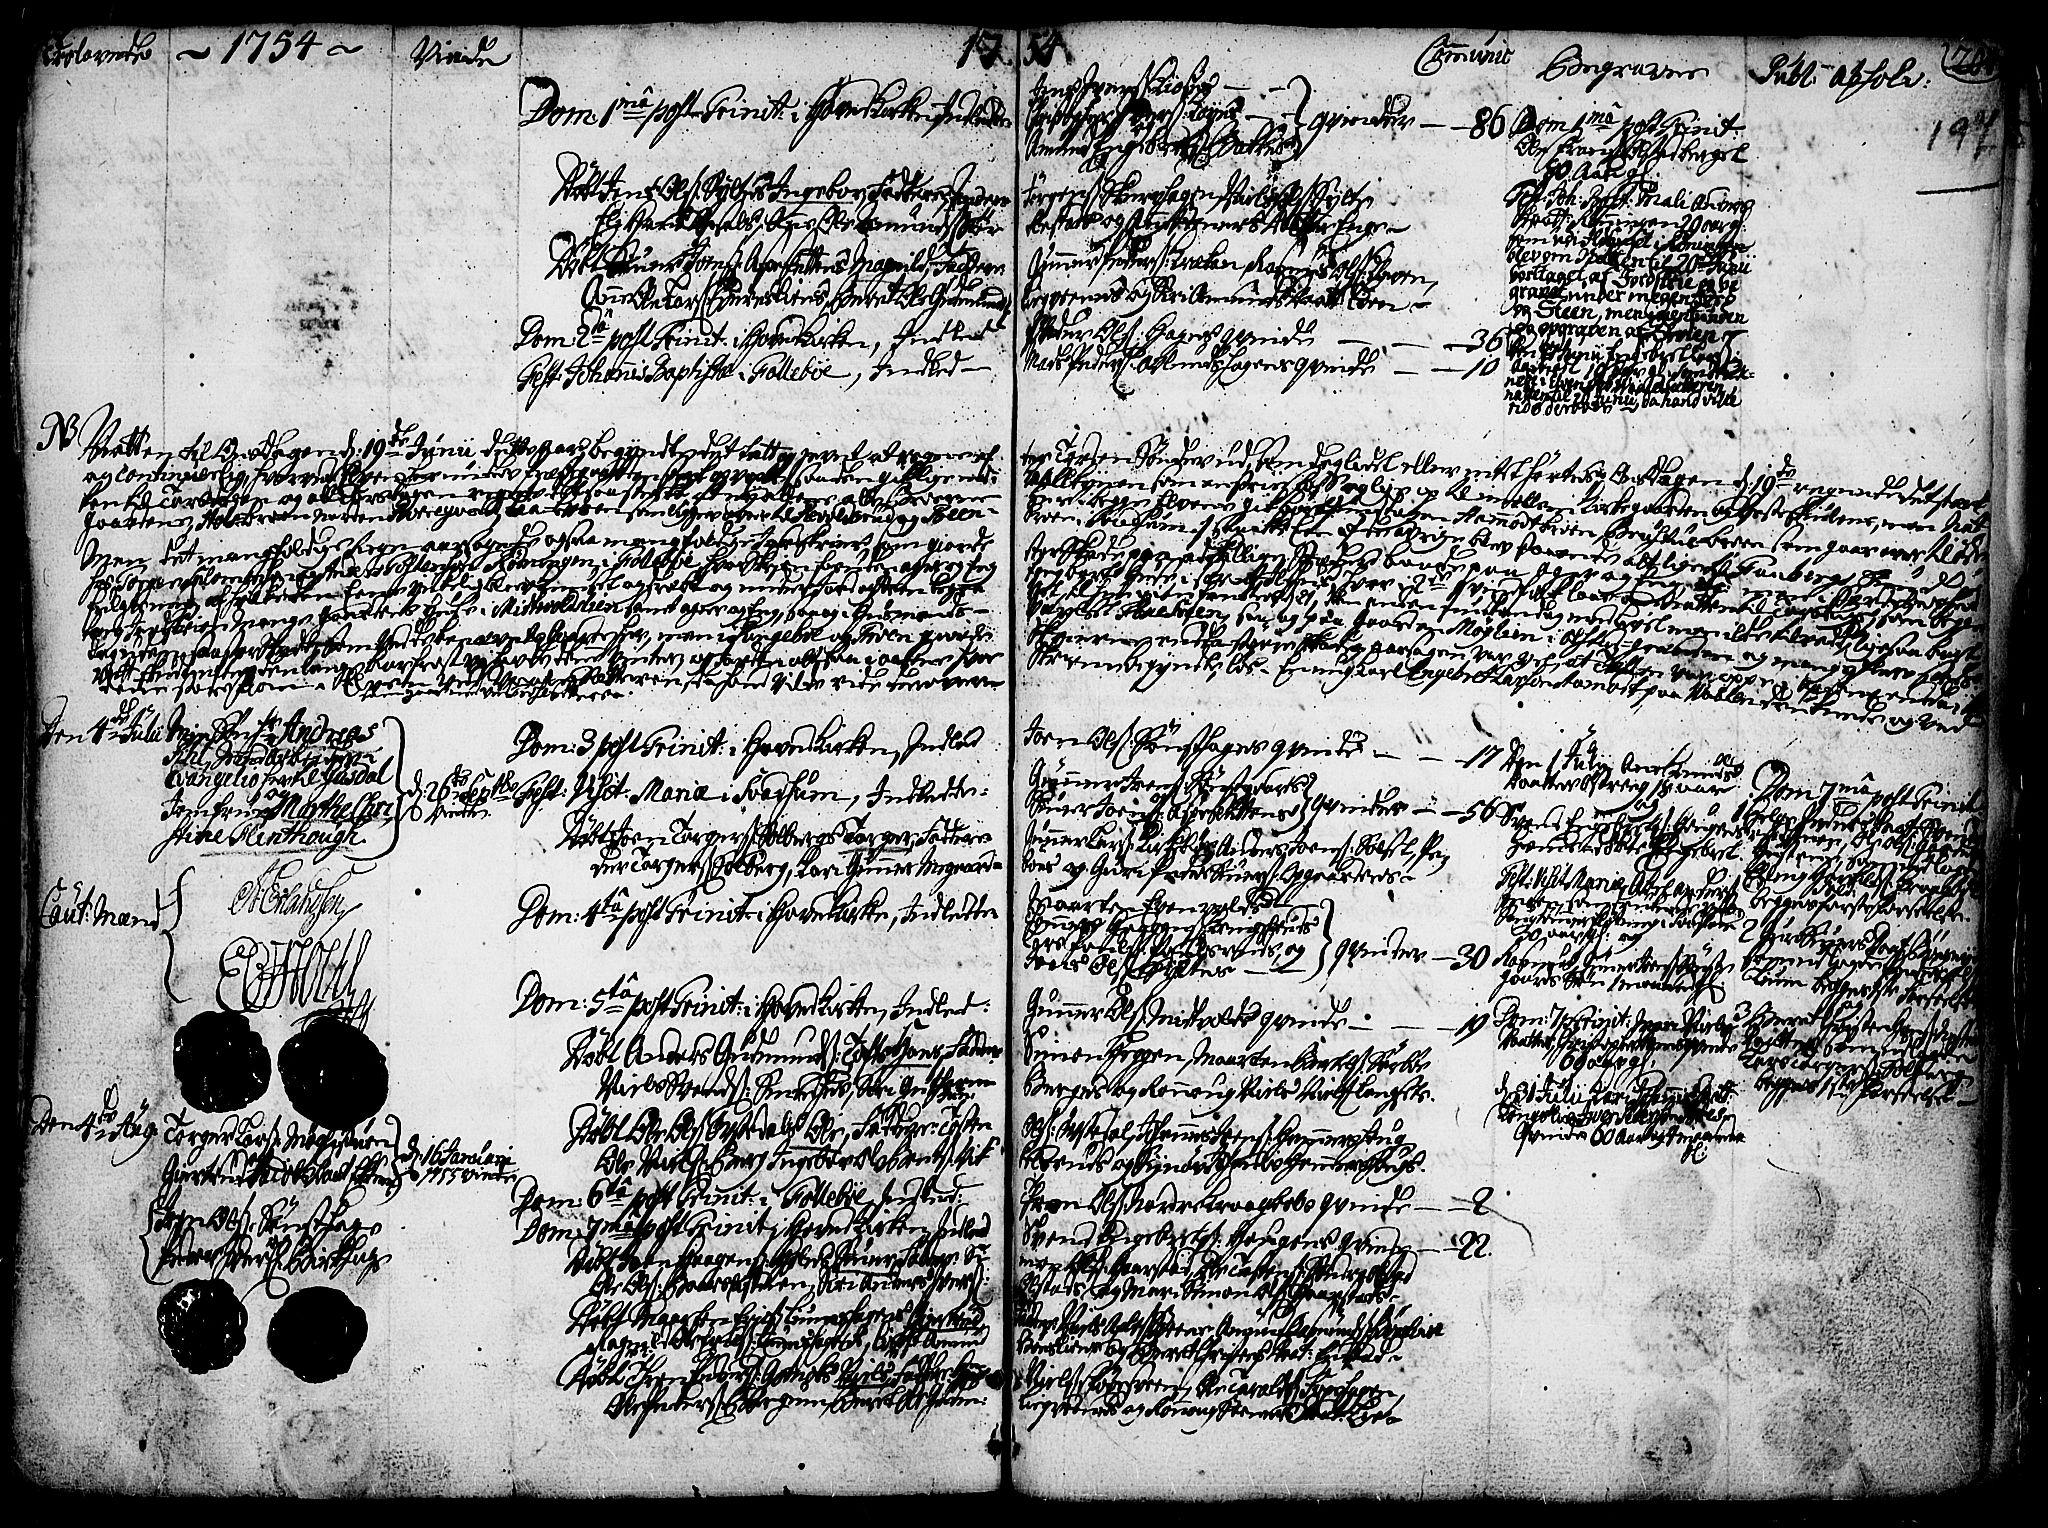 SAH, Gausdal prestekontor, Ministerialbok nr. 2, 1729-1757, s. 197